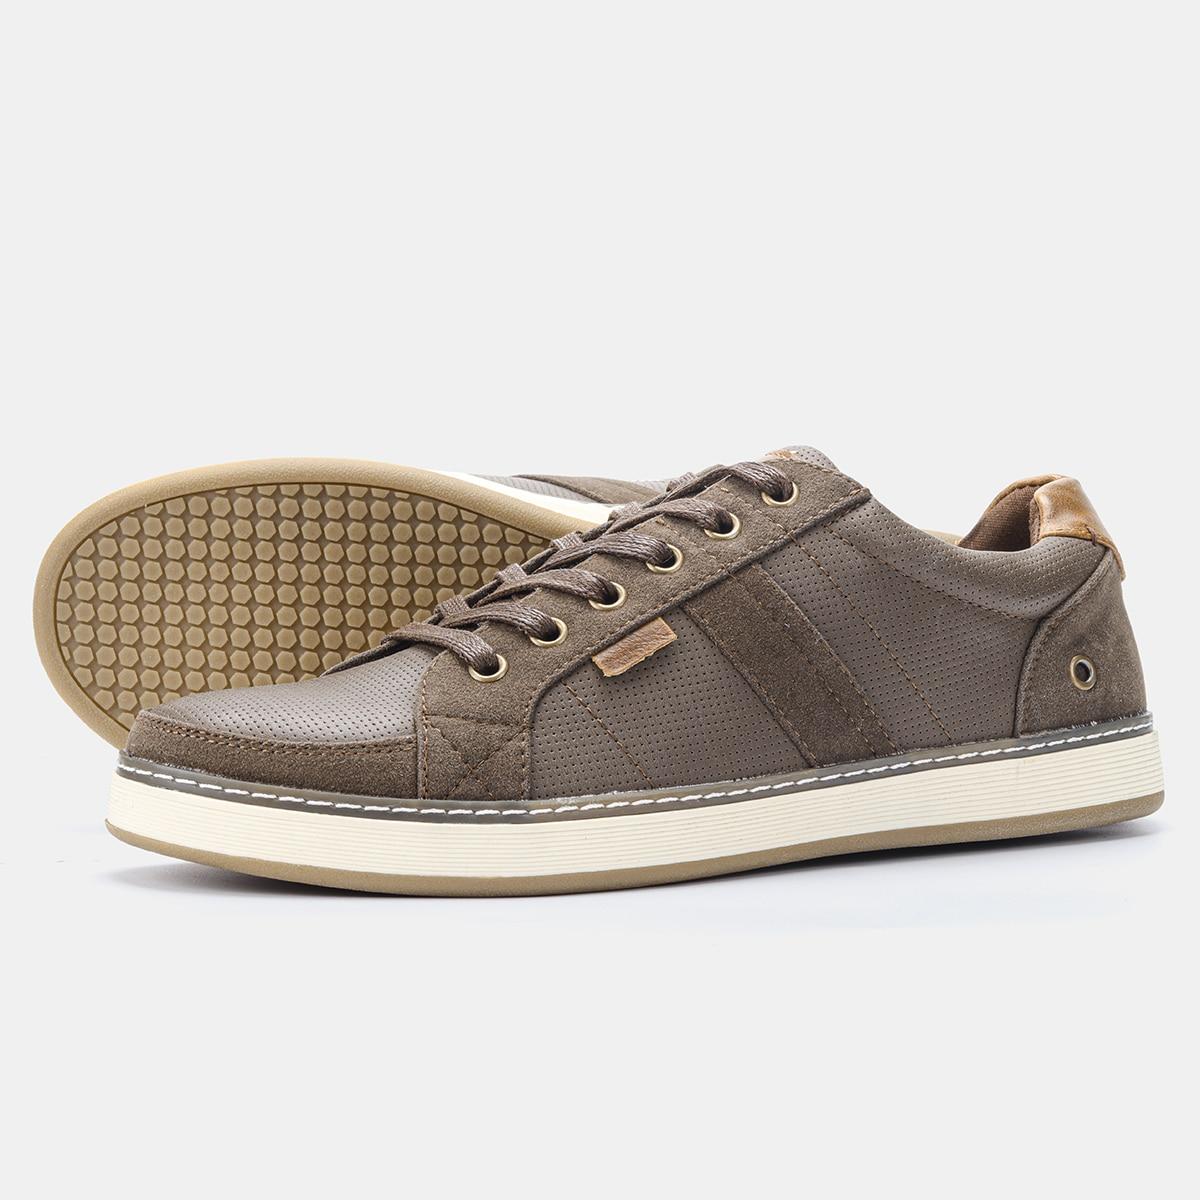 2021 New Men's sneakers Breathable Men Summer Shoes Comfortable Fashion men's casual shoes